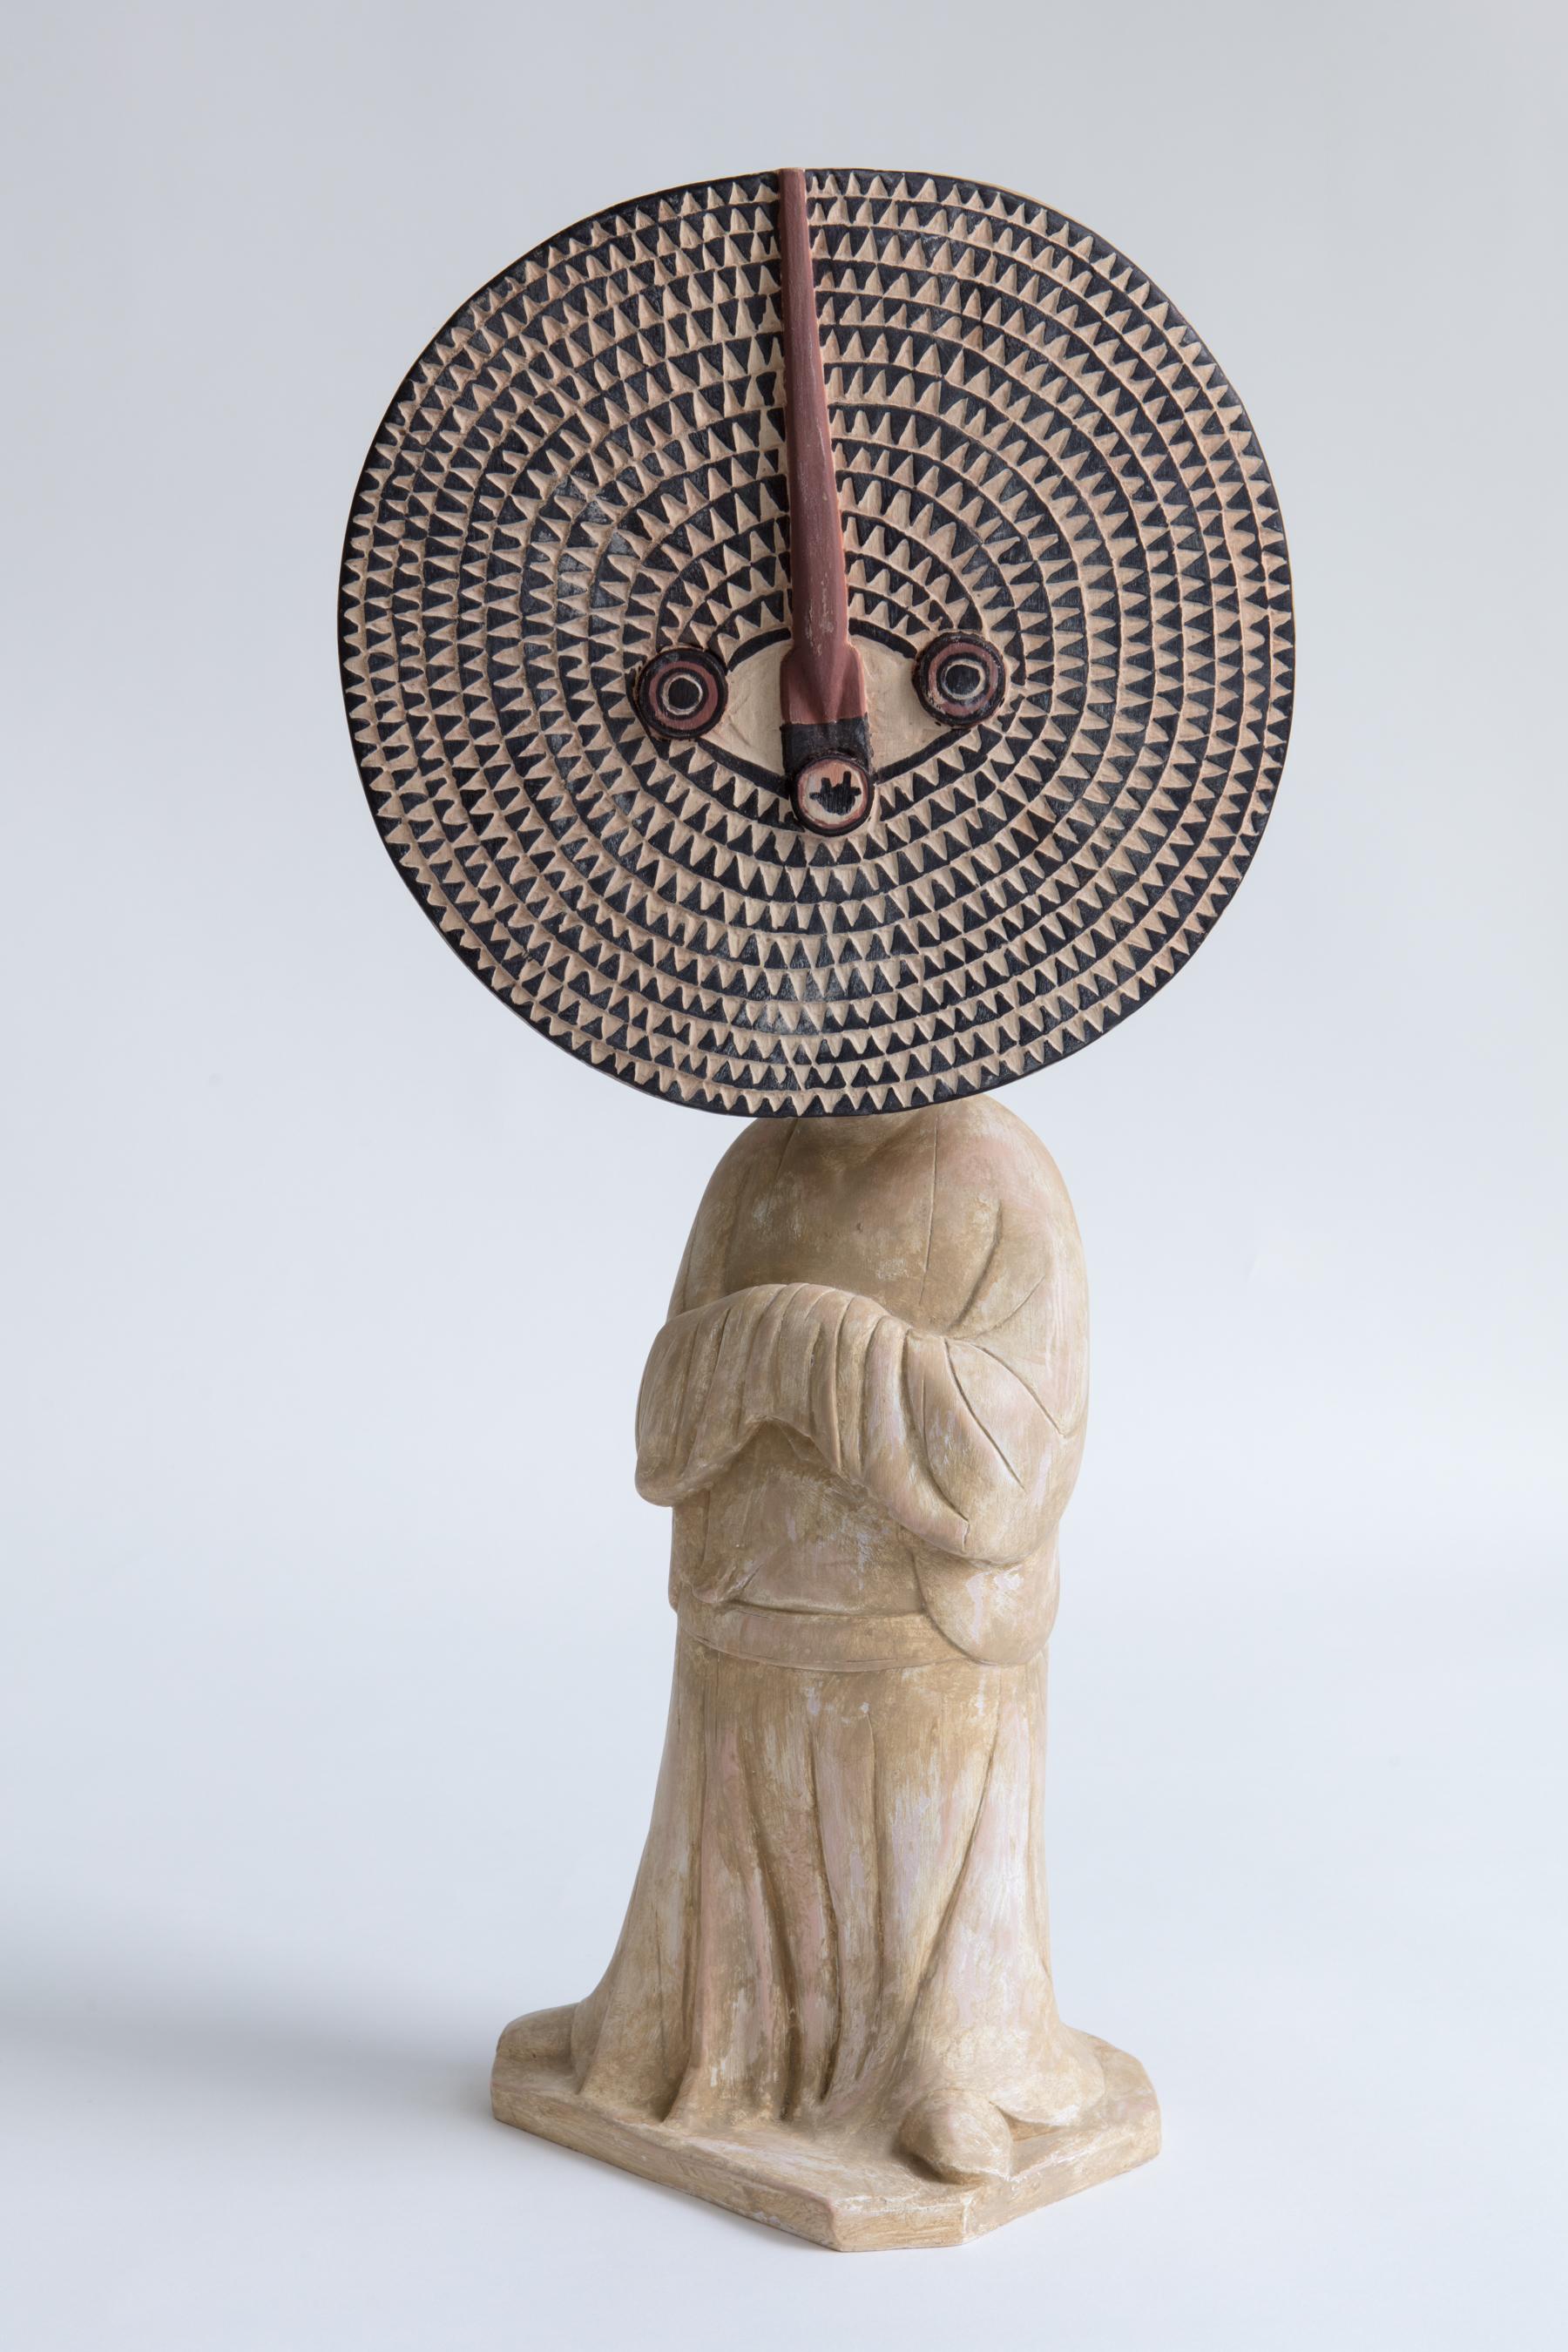 XU ZHEN®,  Evolution-Standing Female Attendant , 2017, Masque Bwa Bobo, Composite minéral, pigments minéraux, inox 60 x 27 x 19 cm. Edition de 99. Courtoisie de l'artiste & MadeIn Gallery.